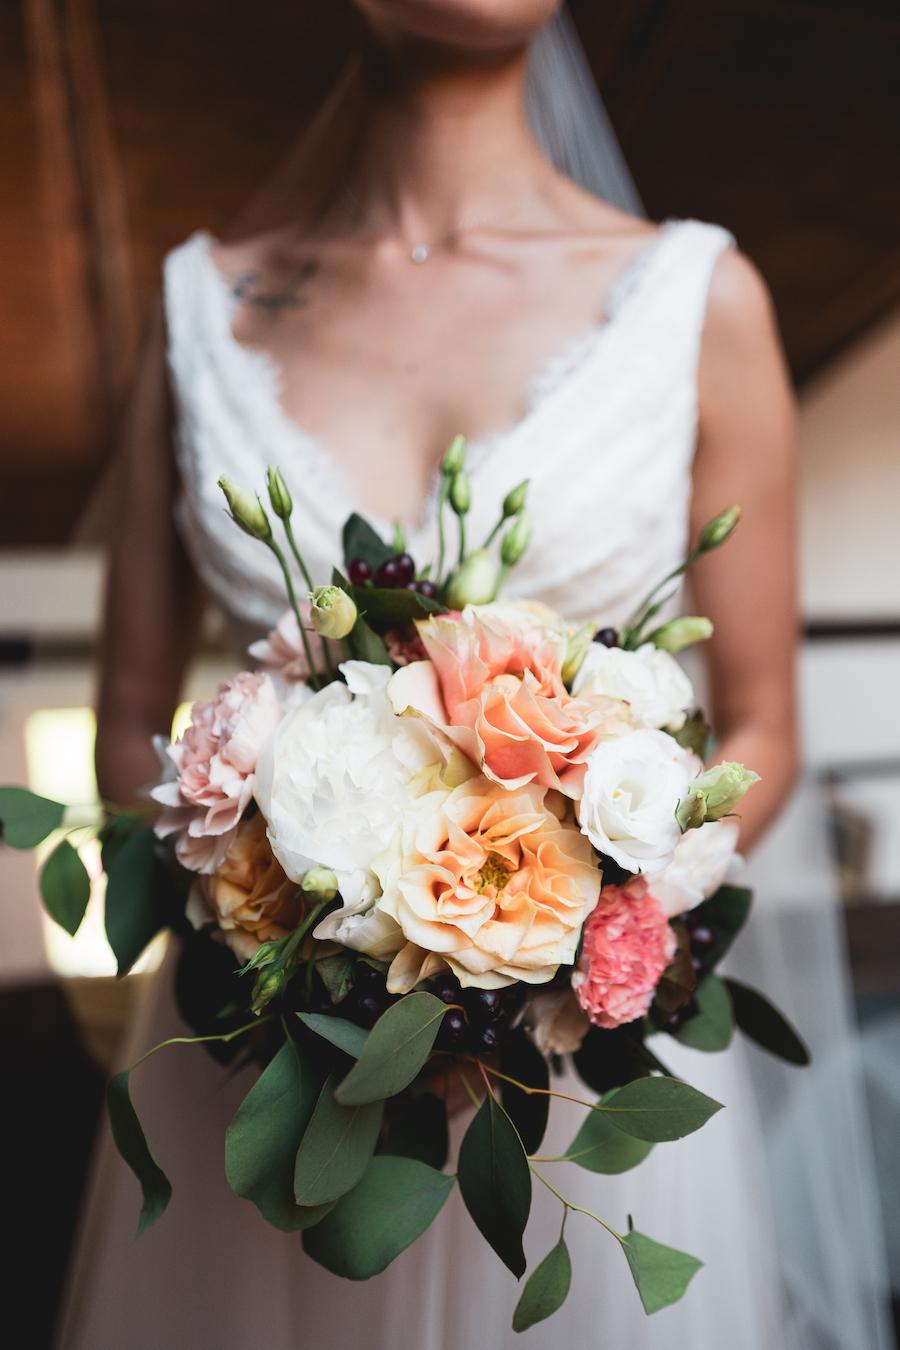 Matrimonio Tema Botanico : Un matrimonio botanico a tema origami wedding wonderland